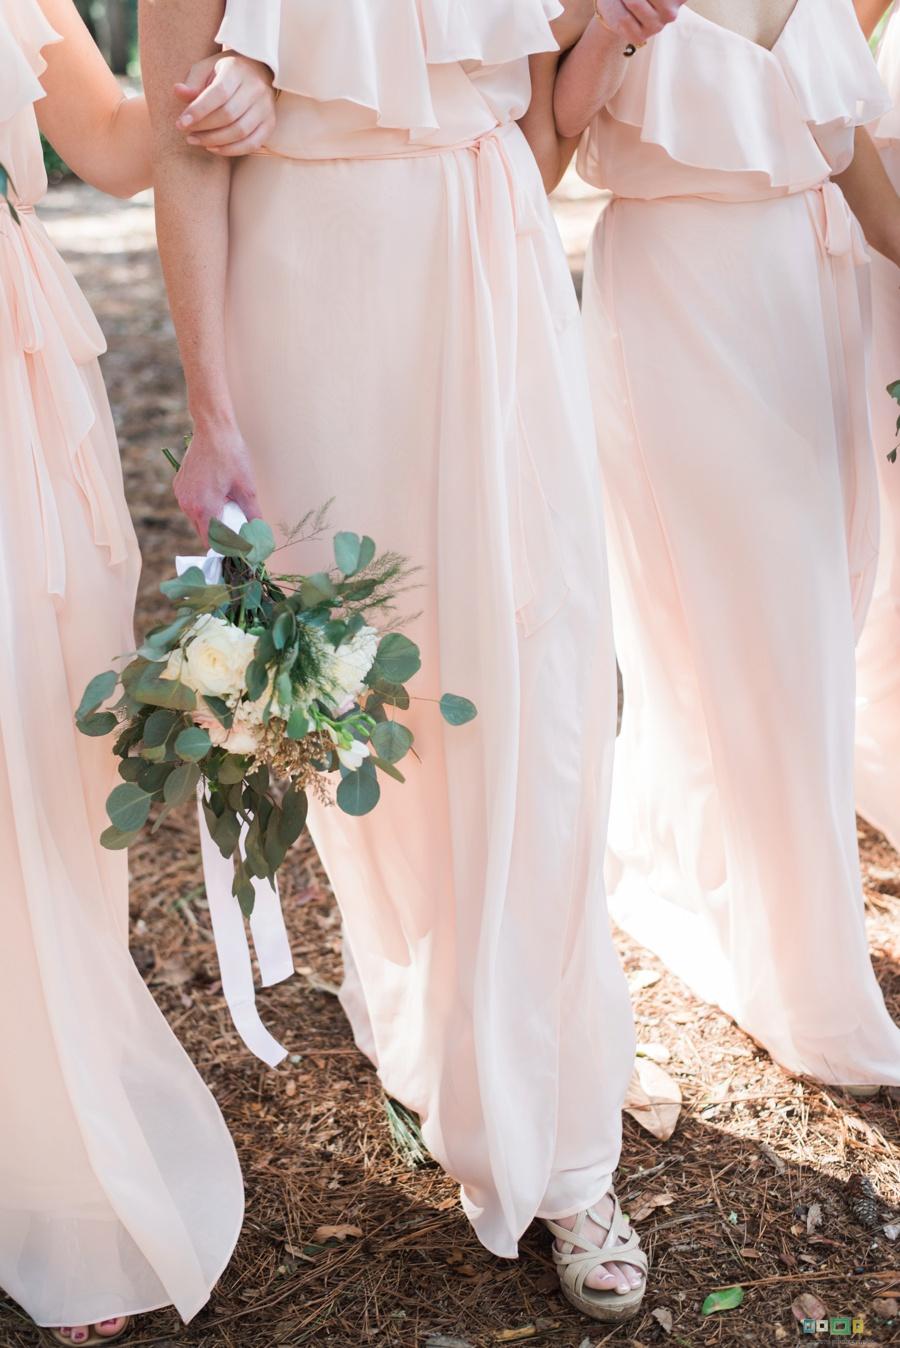 alea-moore-photography-Daufuskie-Island-wedding-ivory-and-beau-bridal-boutique-dakota-nicole-miller-rebecca-schoneveld-marisol-classic-southern-wedding-savannah-wedding-dresses-savannah-bridal-boutique-savannah-weddings-savannah-bridal-gowns-12.jpg